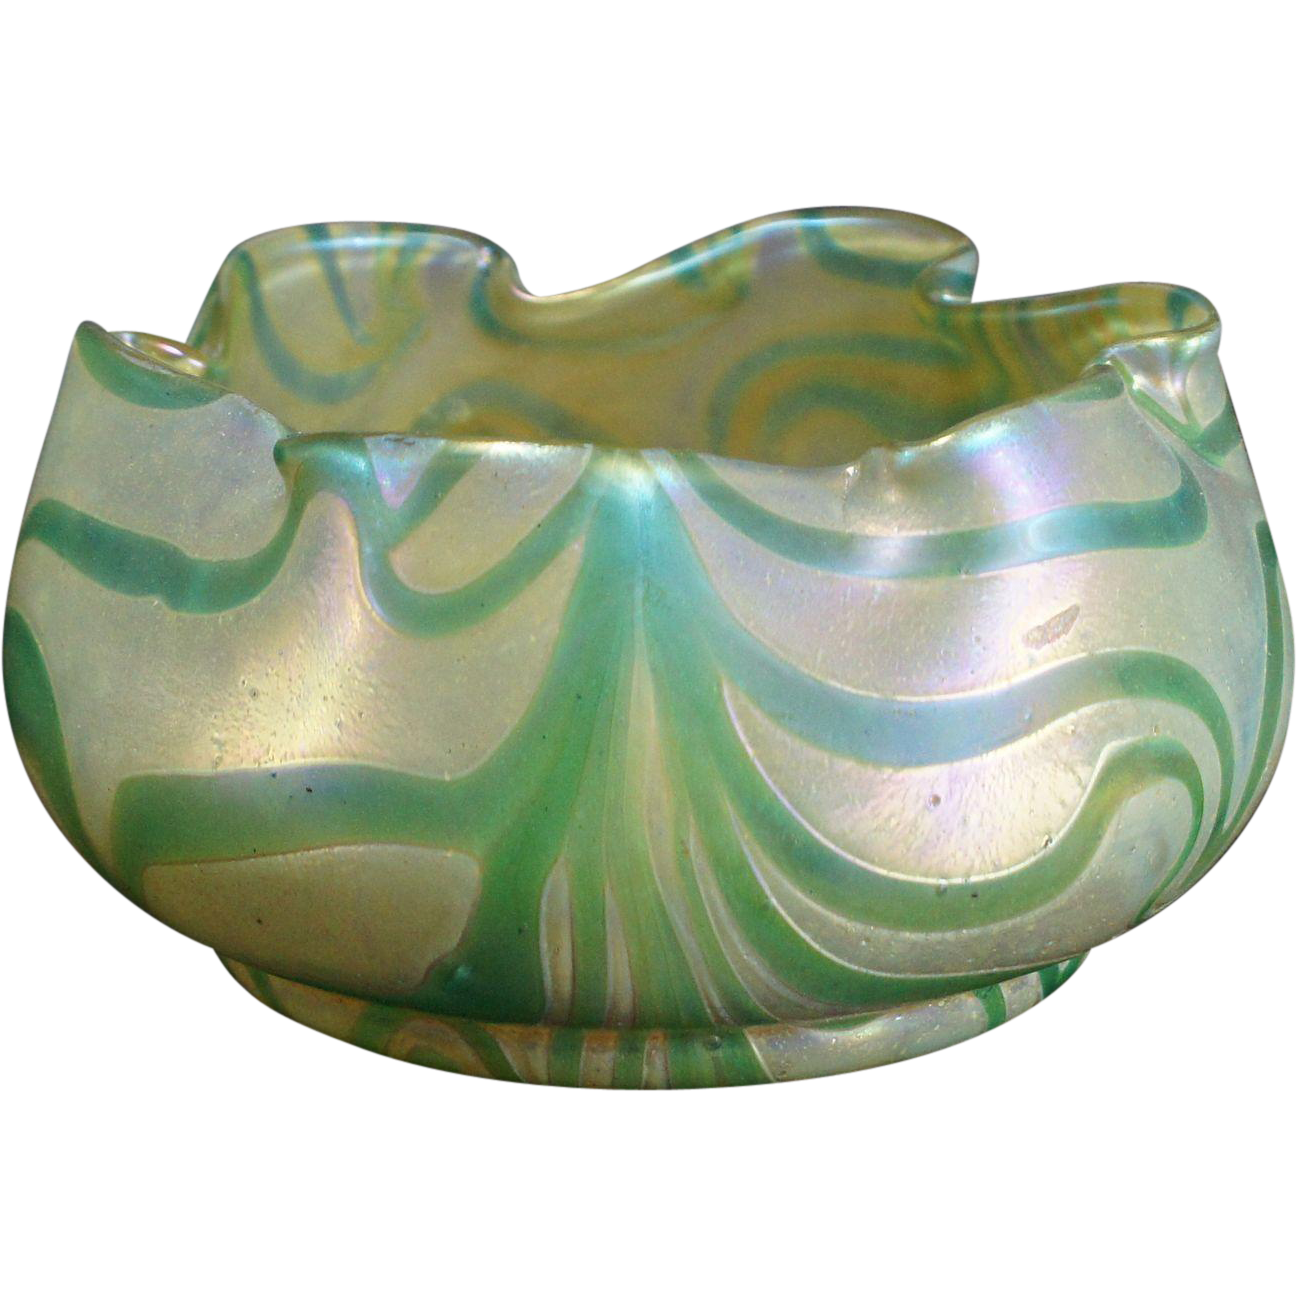 Stunning Wilhelm Kralik Sohn, Eleonarenhain Art Nouveau Art Glass Bowl c.1902